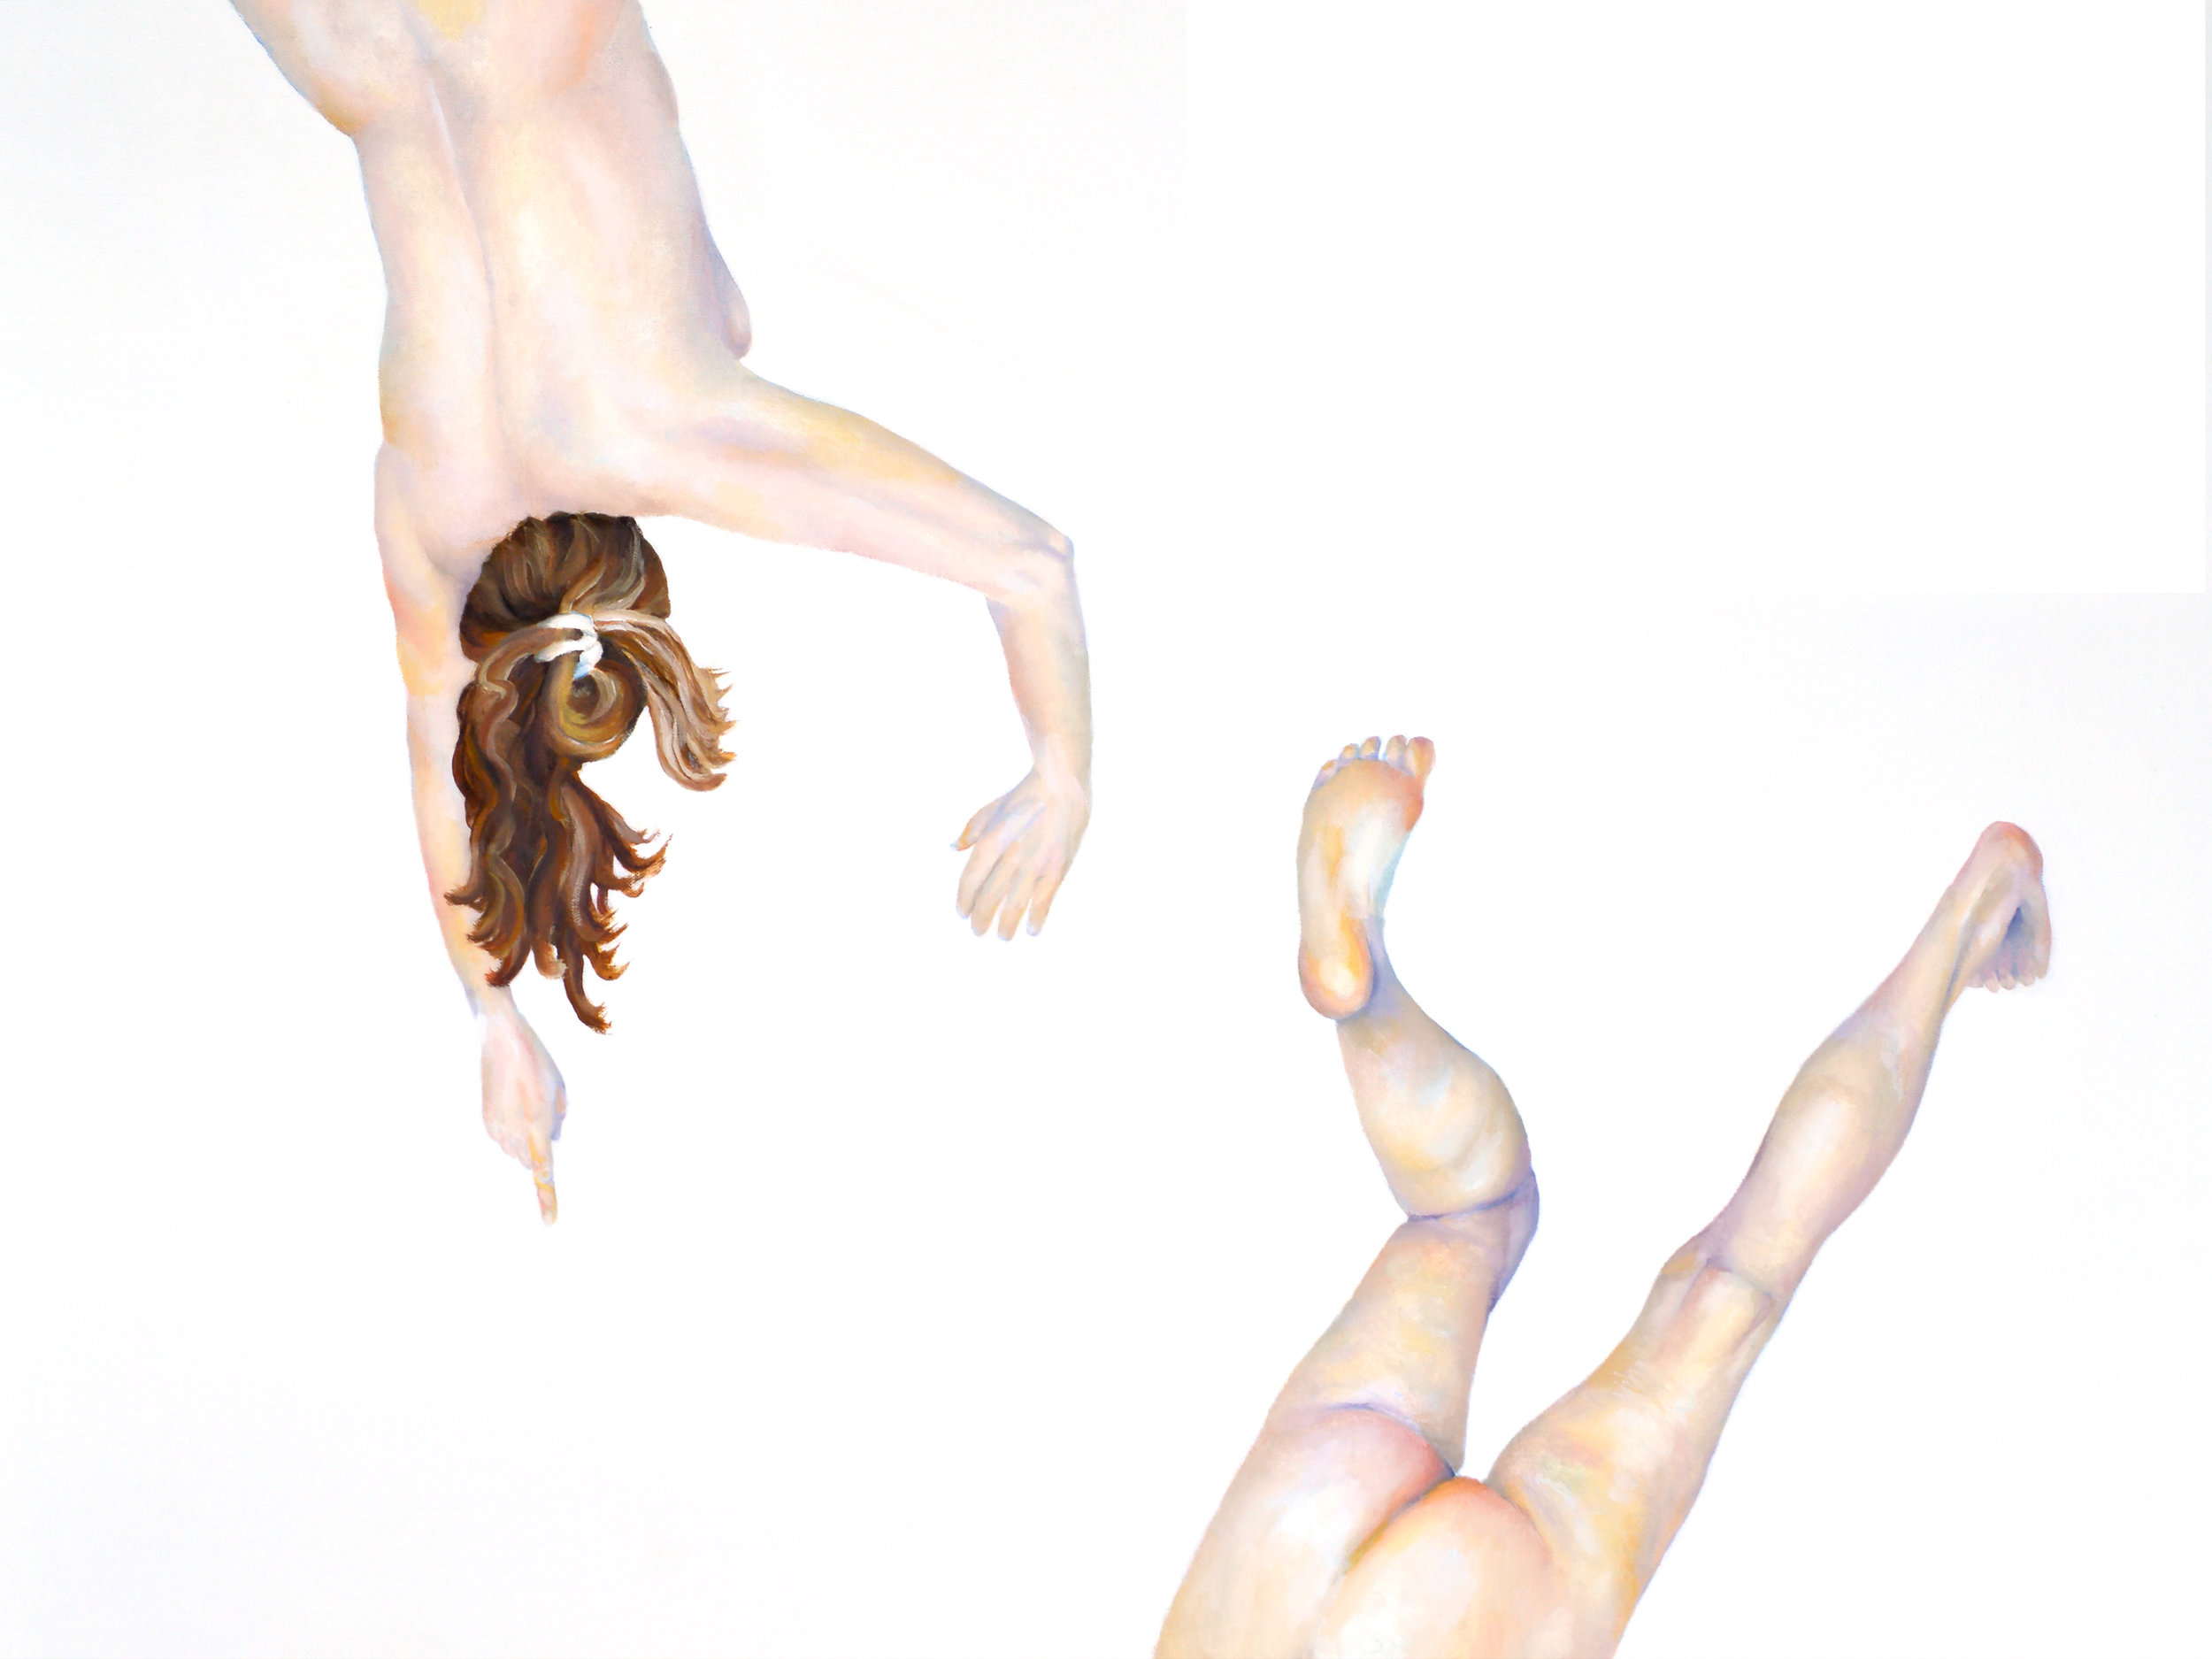 ColleenGaribaldi-Untitled(117)-40x30-OilOnCanvas-2018-$4950.jpg